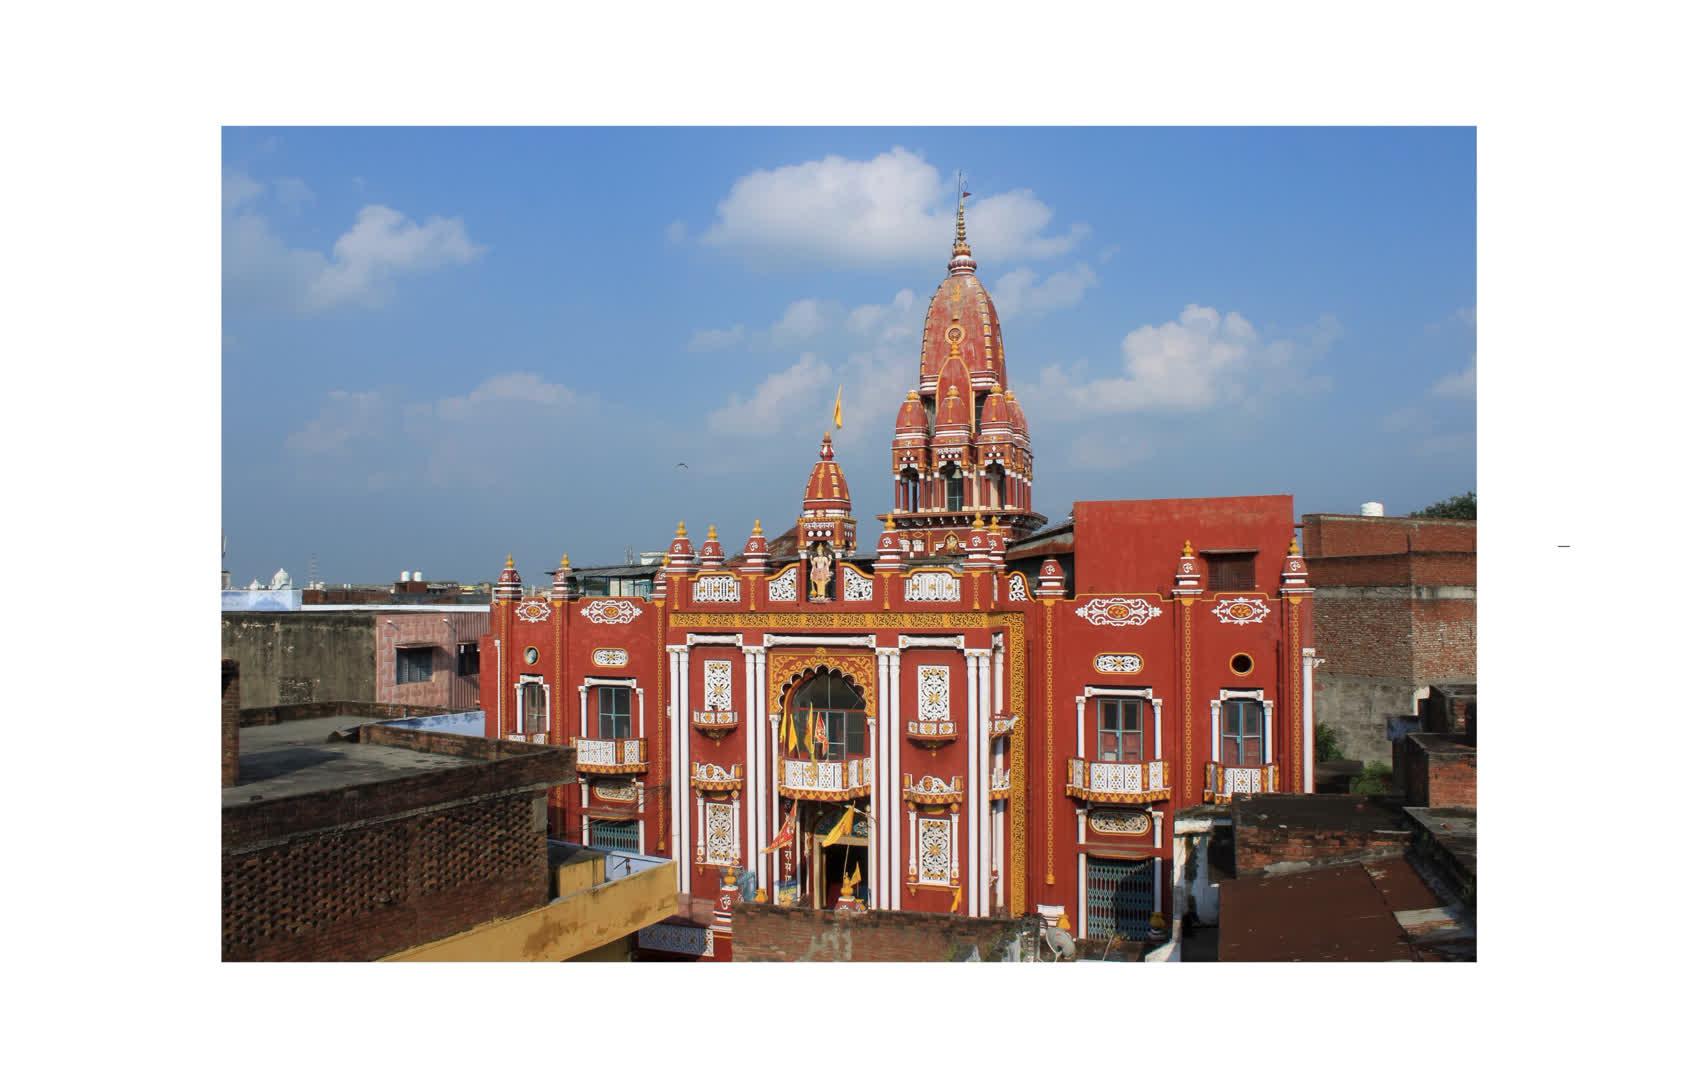 Bareilly: Taming a Provincial Capital